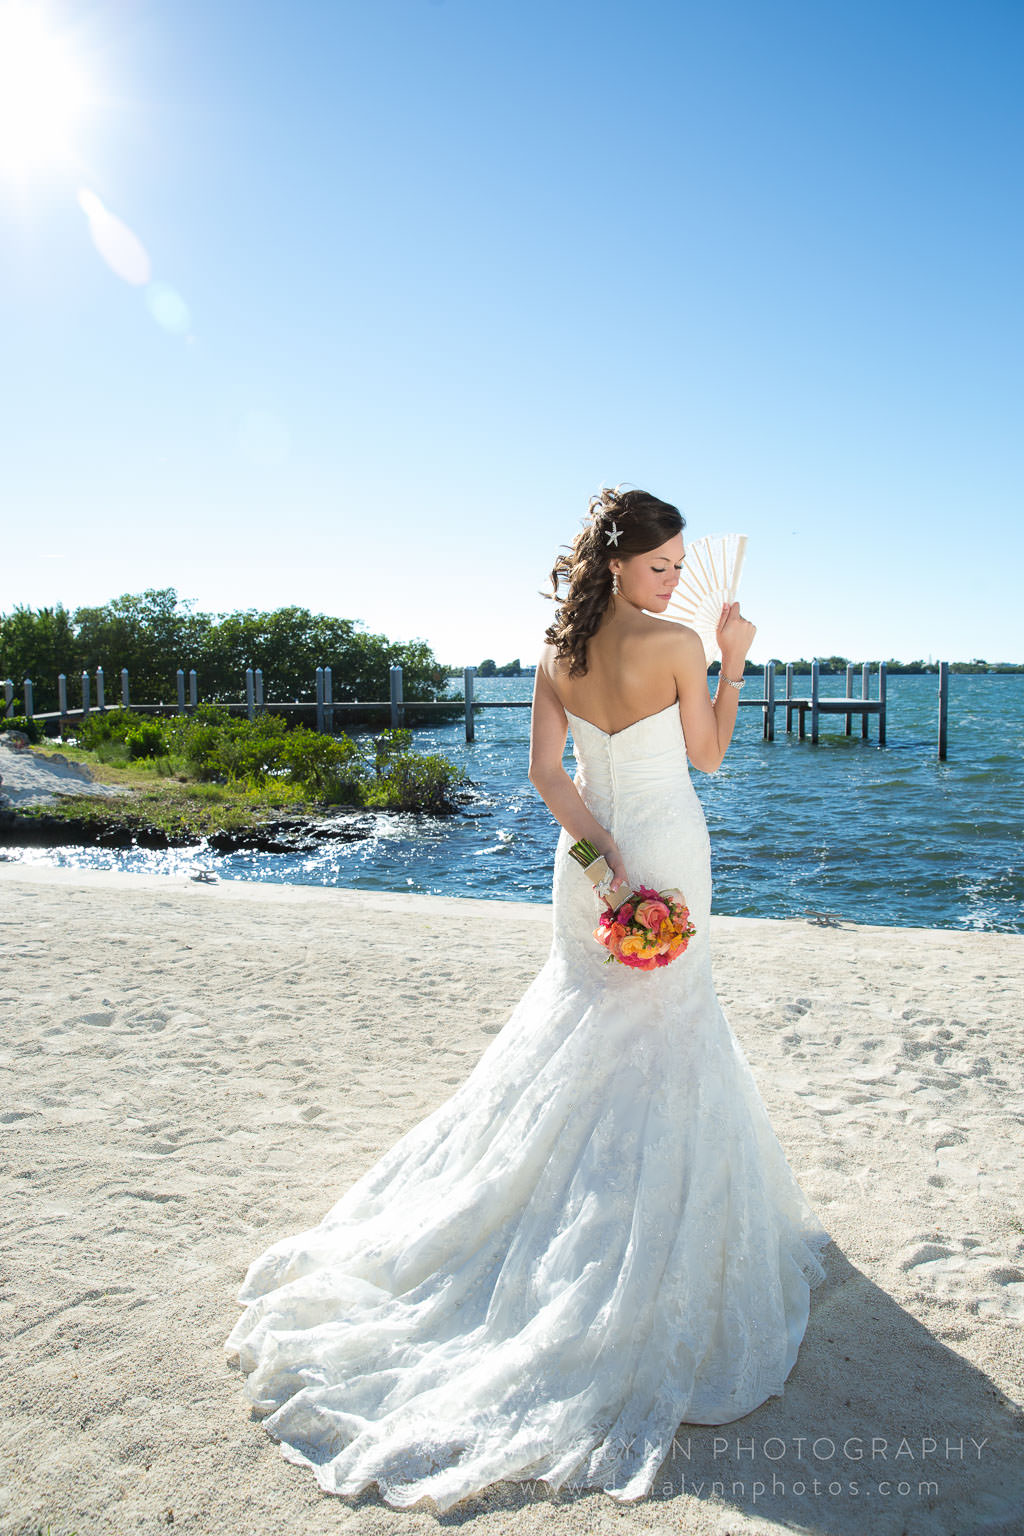 Dana Lynn Photography Wedding Photographer Florida Keys